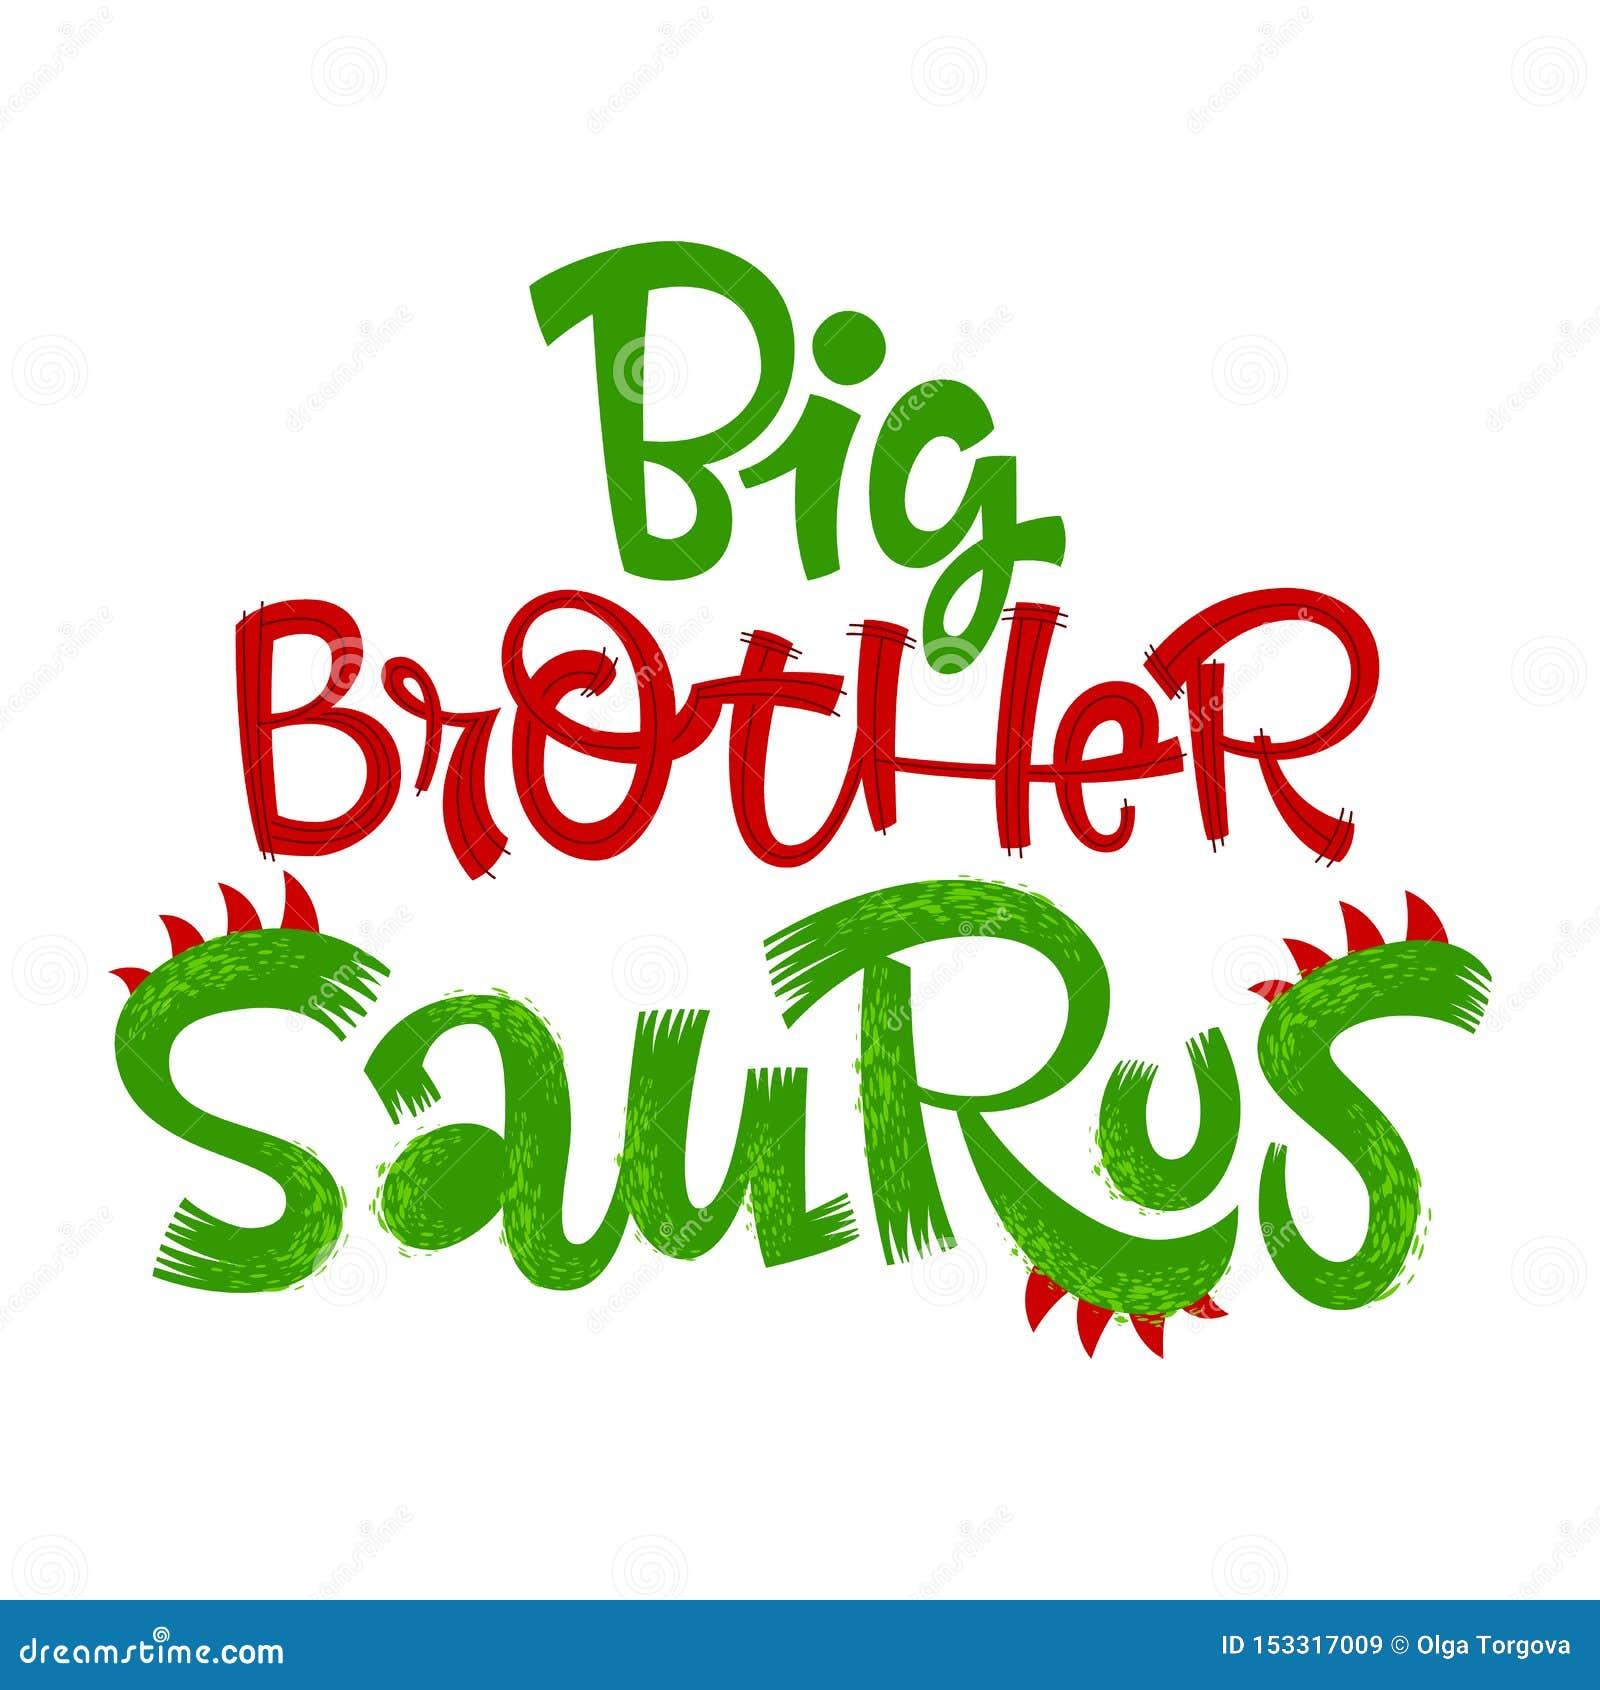 Big Brother Saurus Quote. Fun Handdrawn Dinosaur Style ...